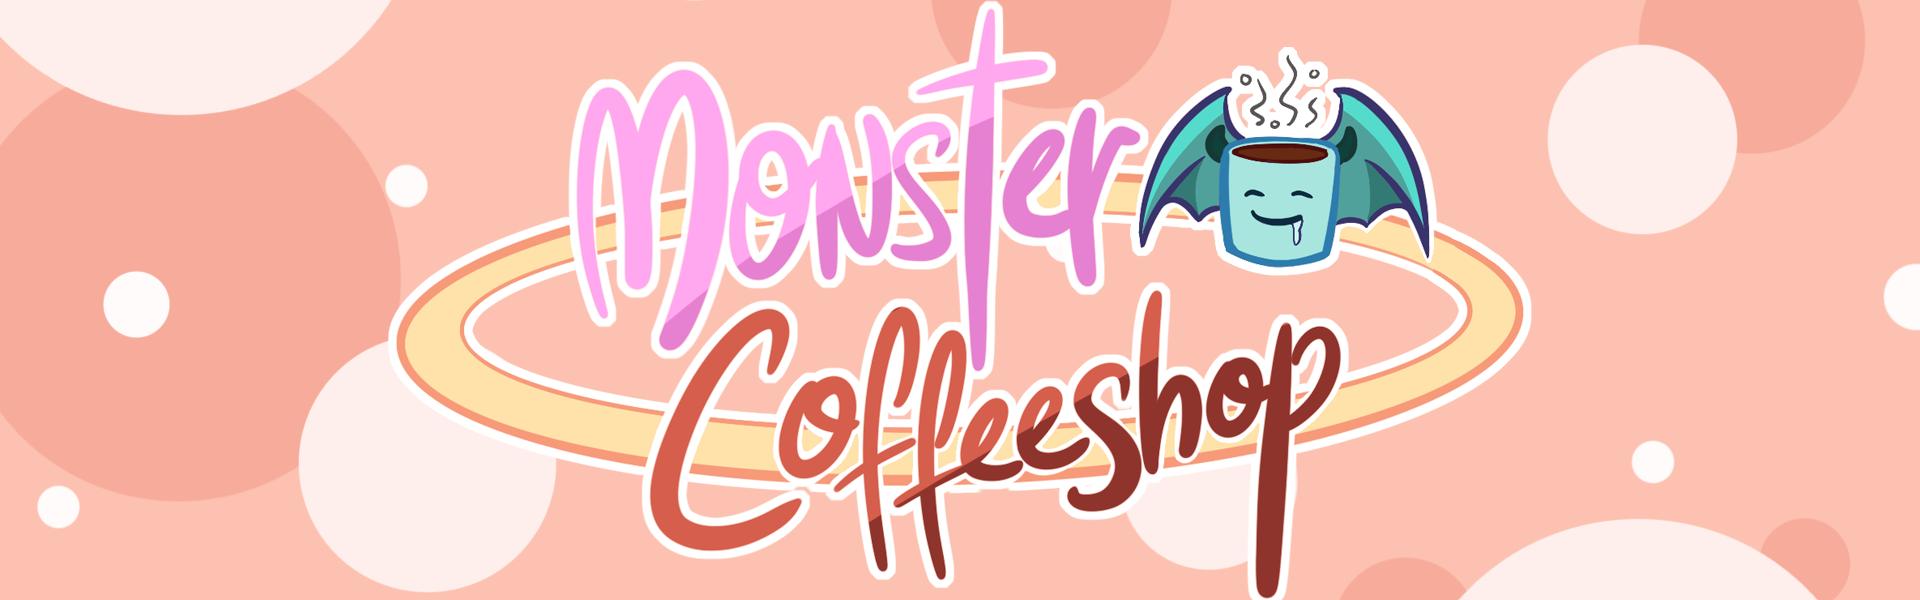 Monster Coffeeshop